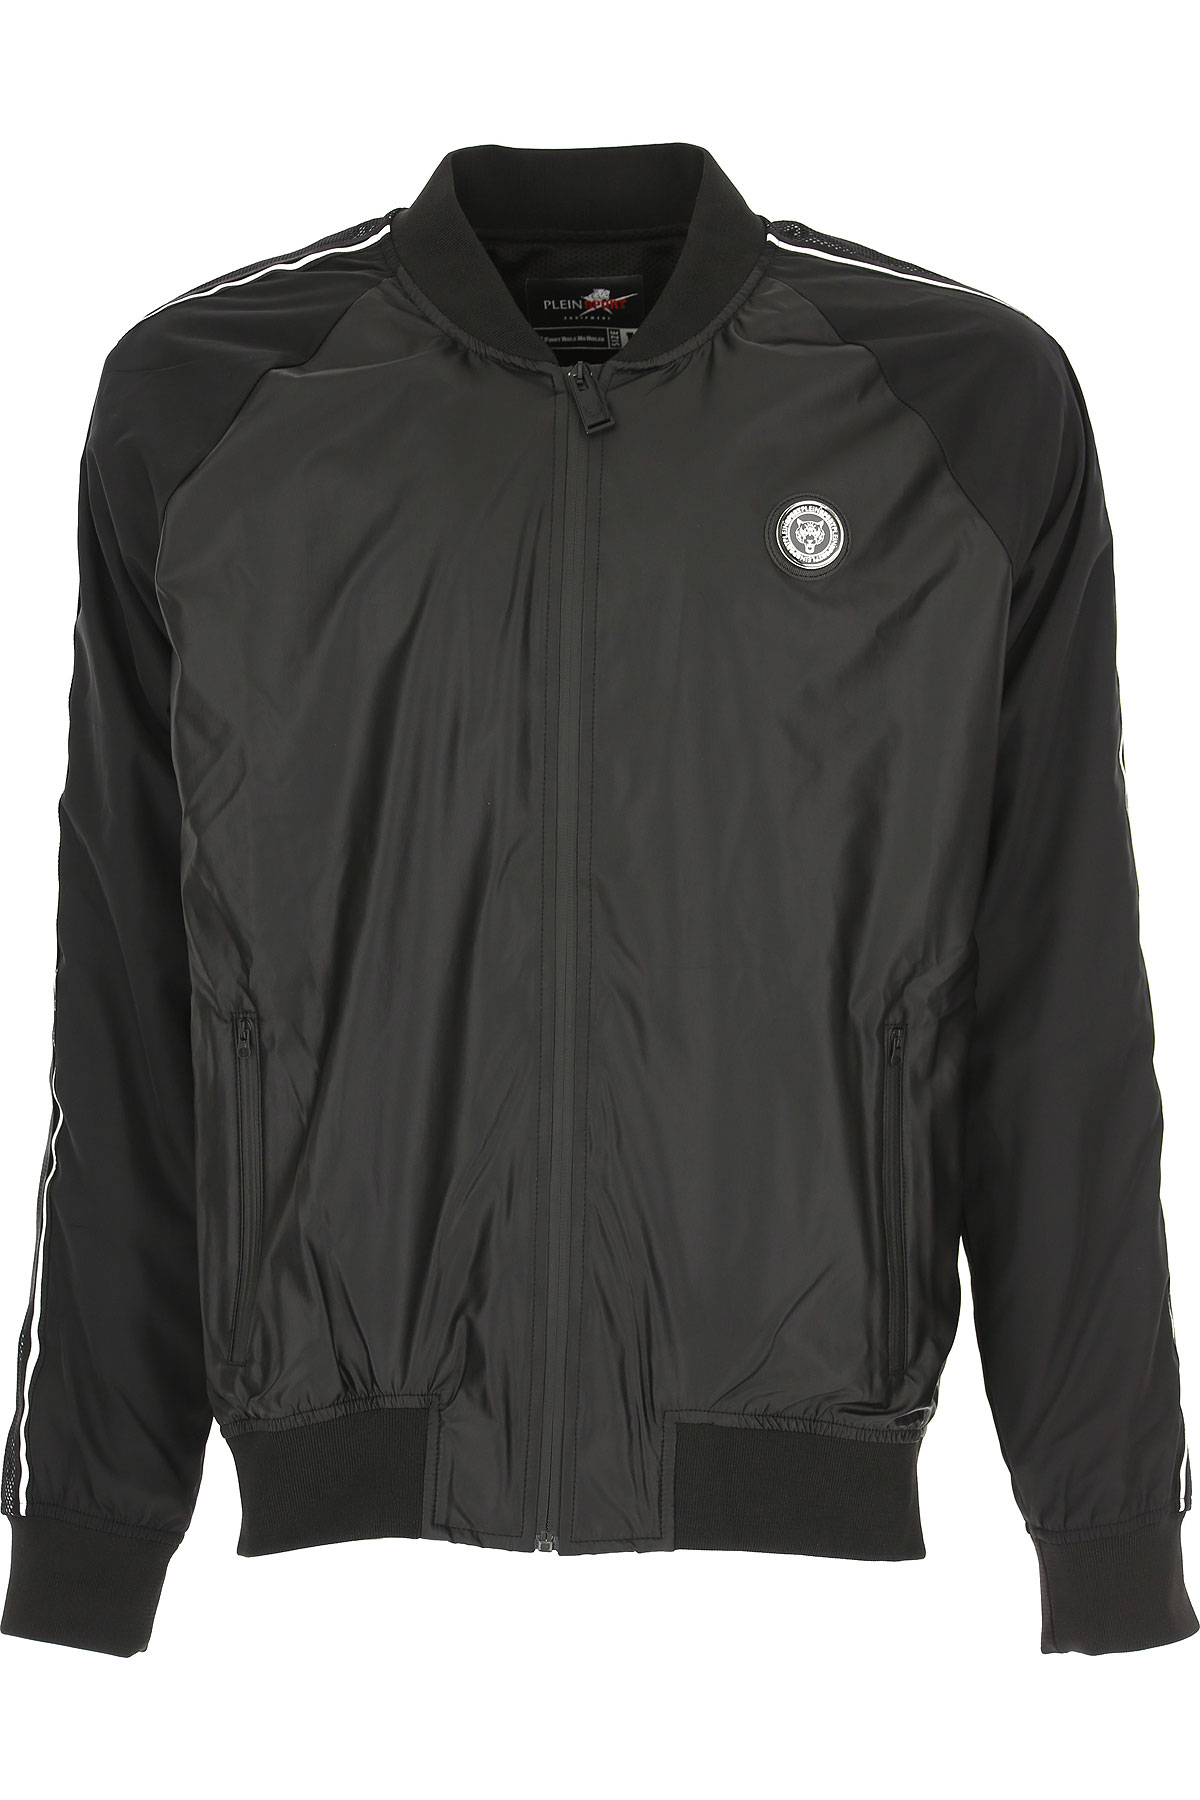 Philipp Plein Jacket for Men On Sale, Black, polyester, 2019, XL XXL